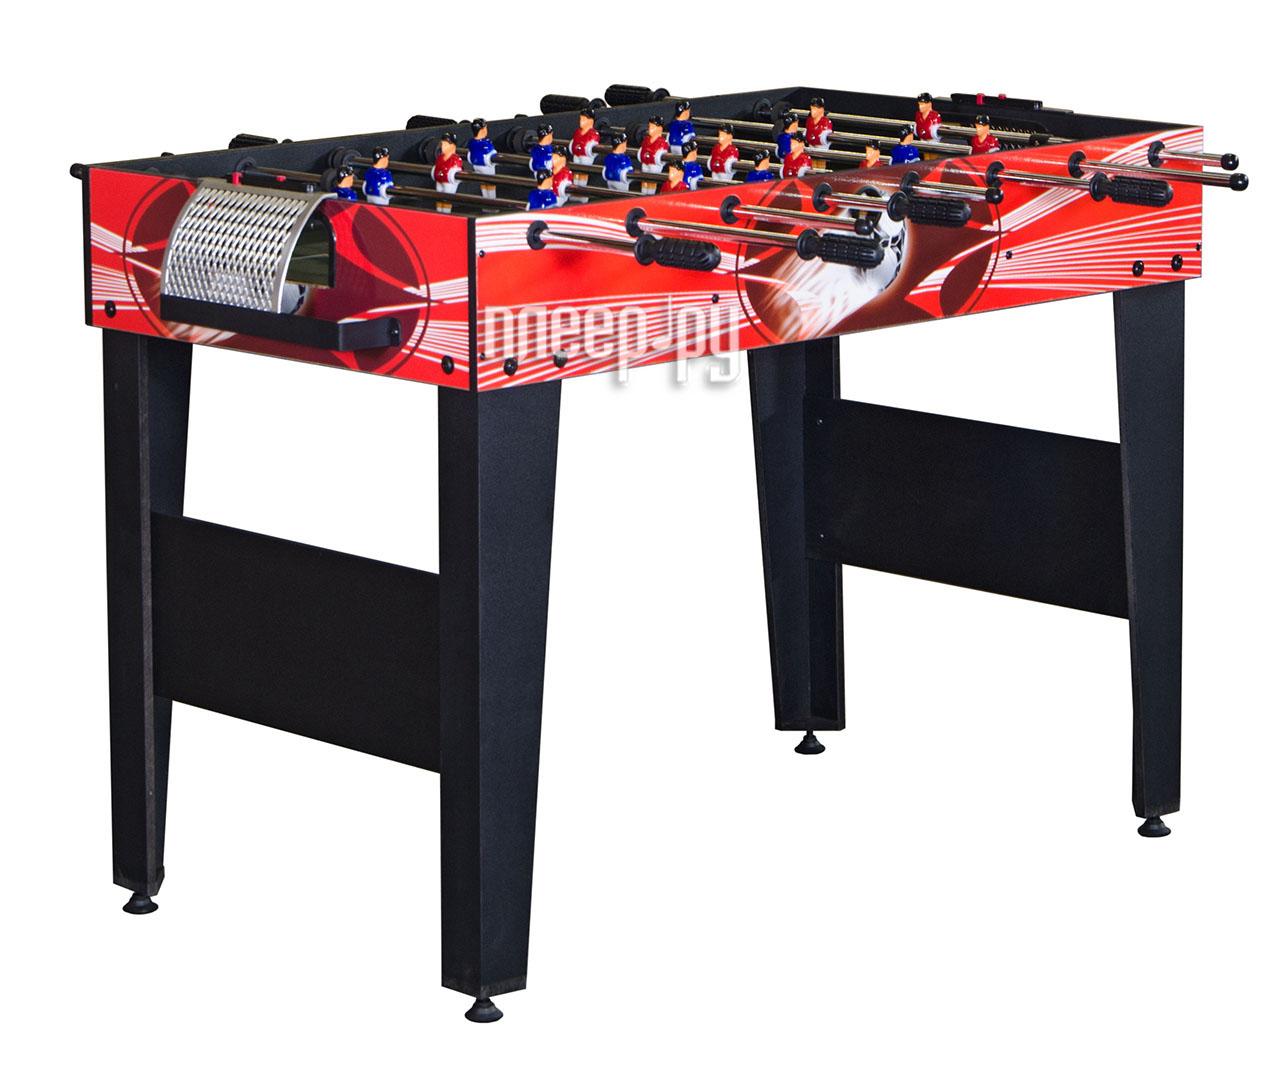 Игровой стол Weekend Flex Red футбол 53.014.04.0